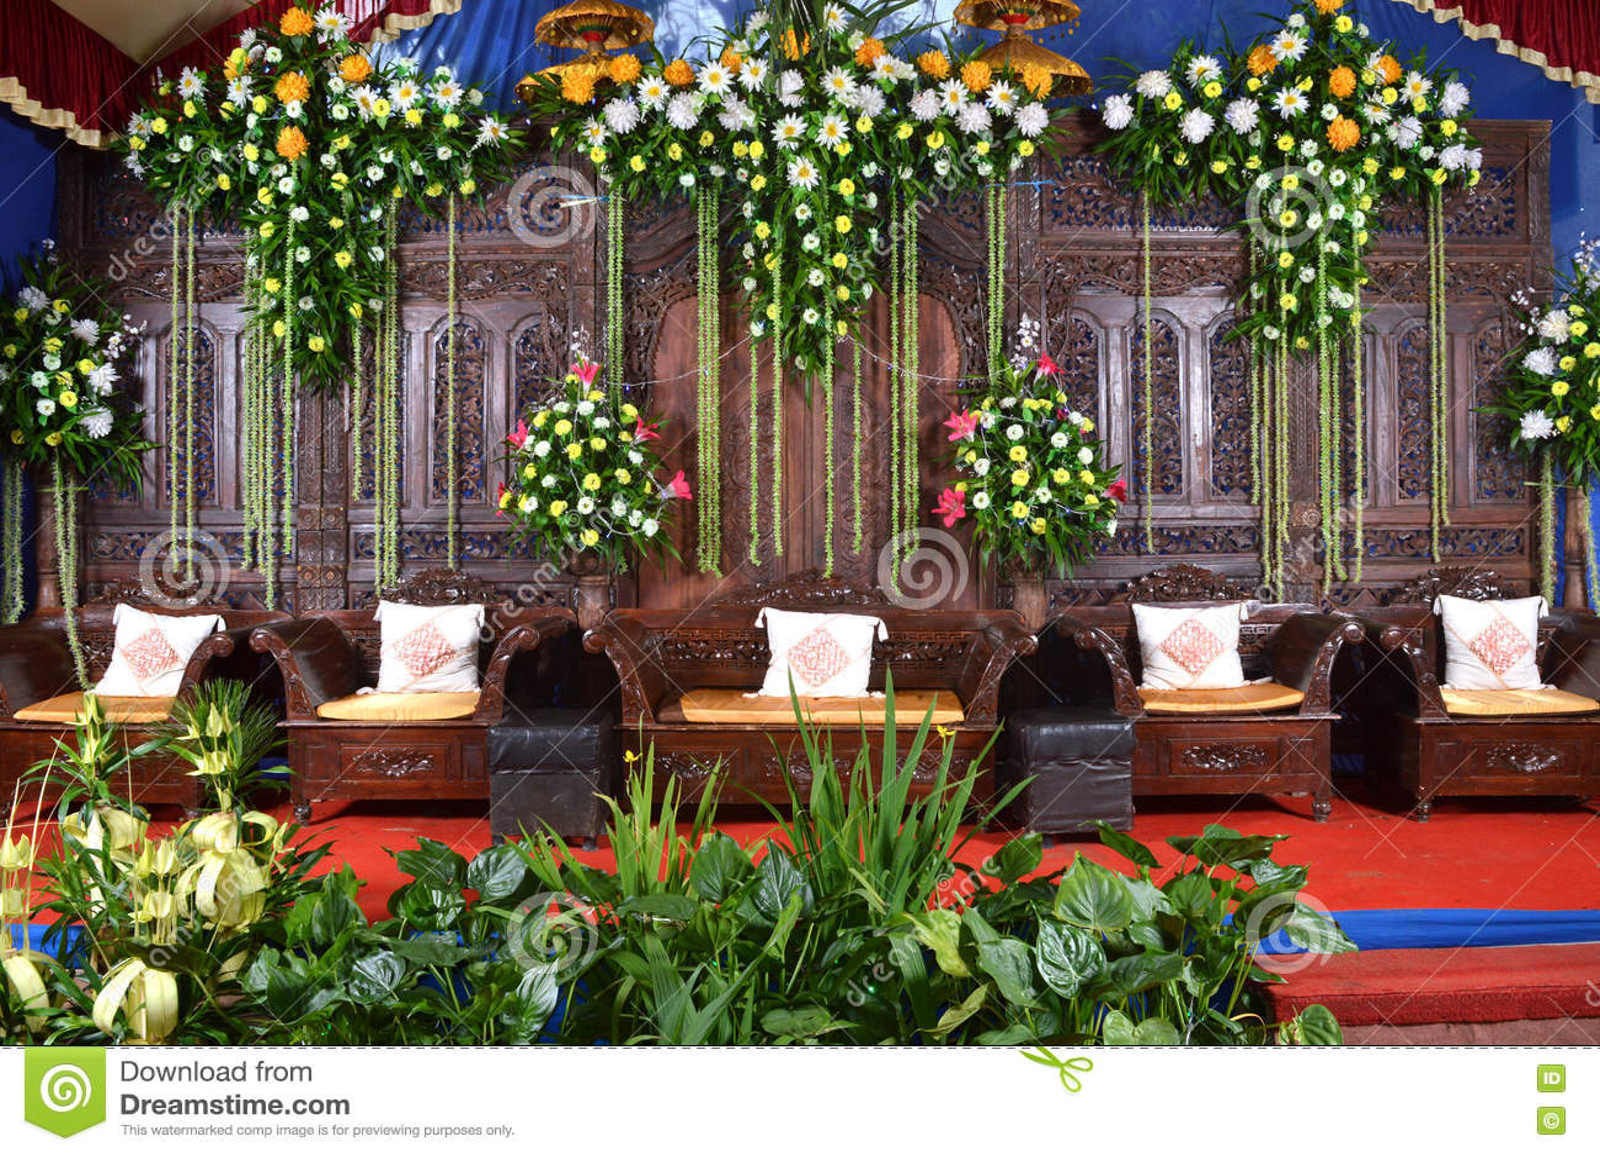 stock foto het huwelijksdecoratie van java dekorasi pernikahan jawa image